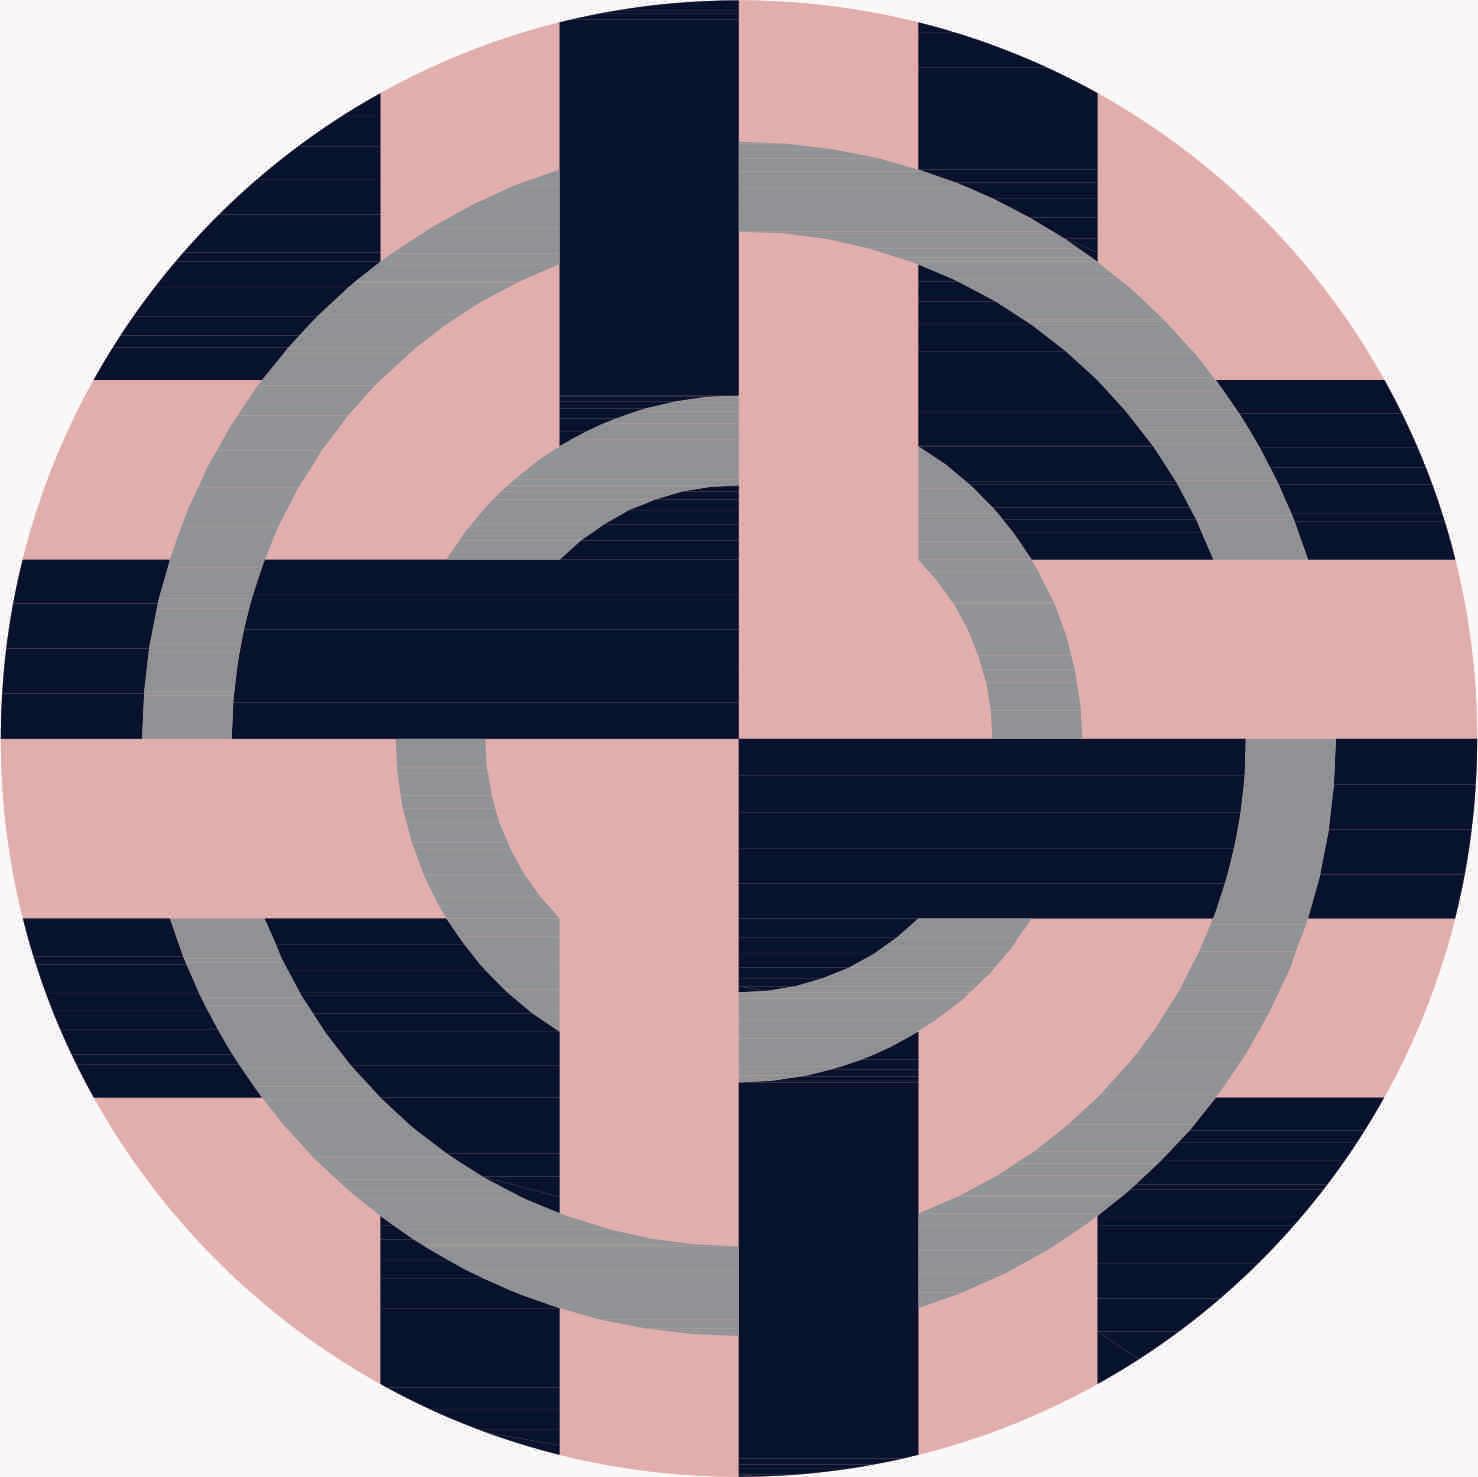 34 | Concentric - Nigel Logan